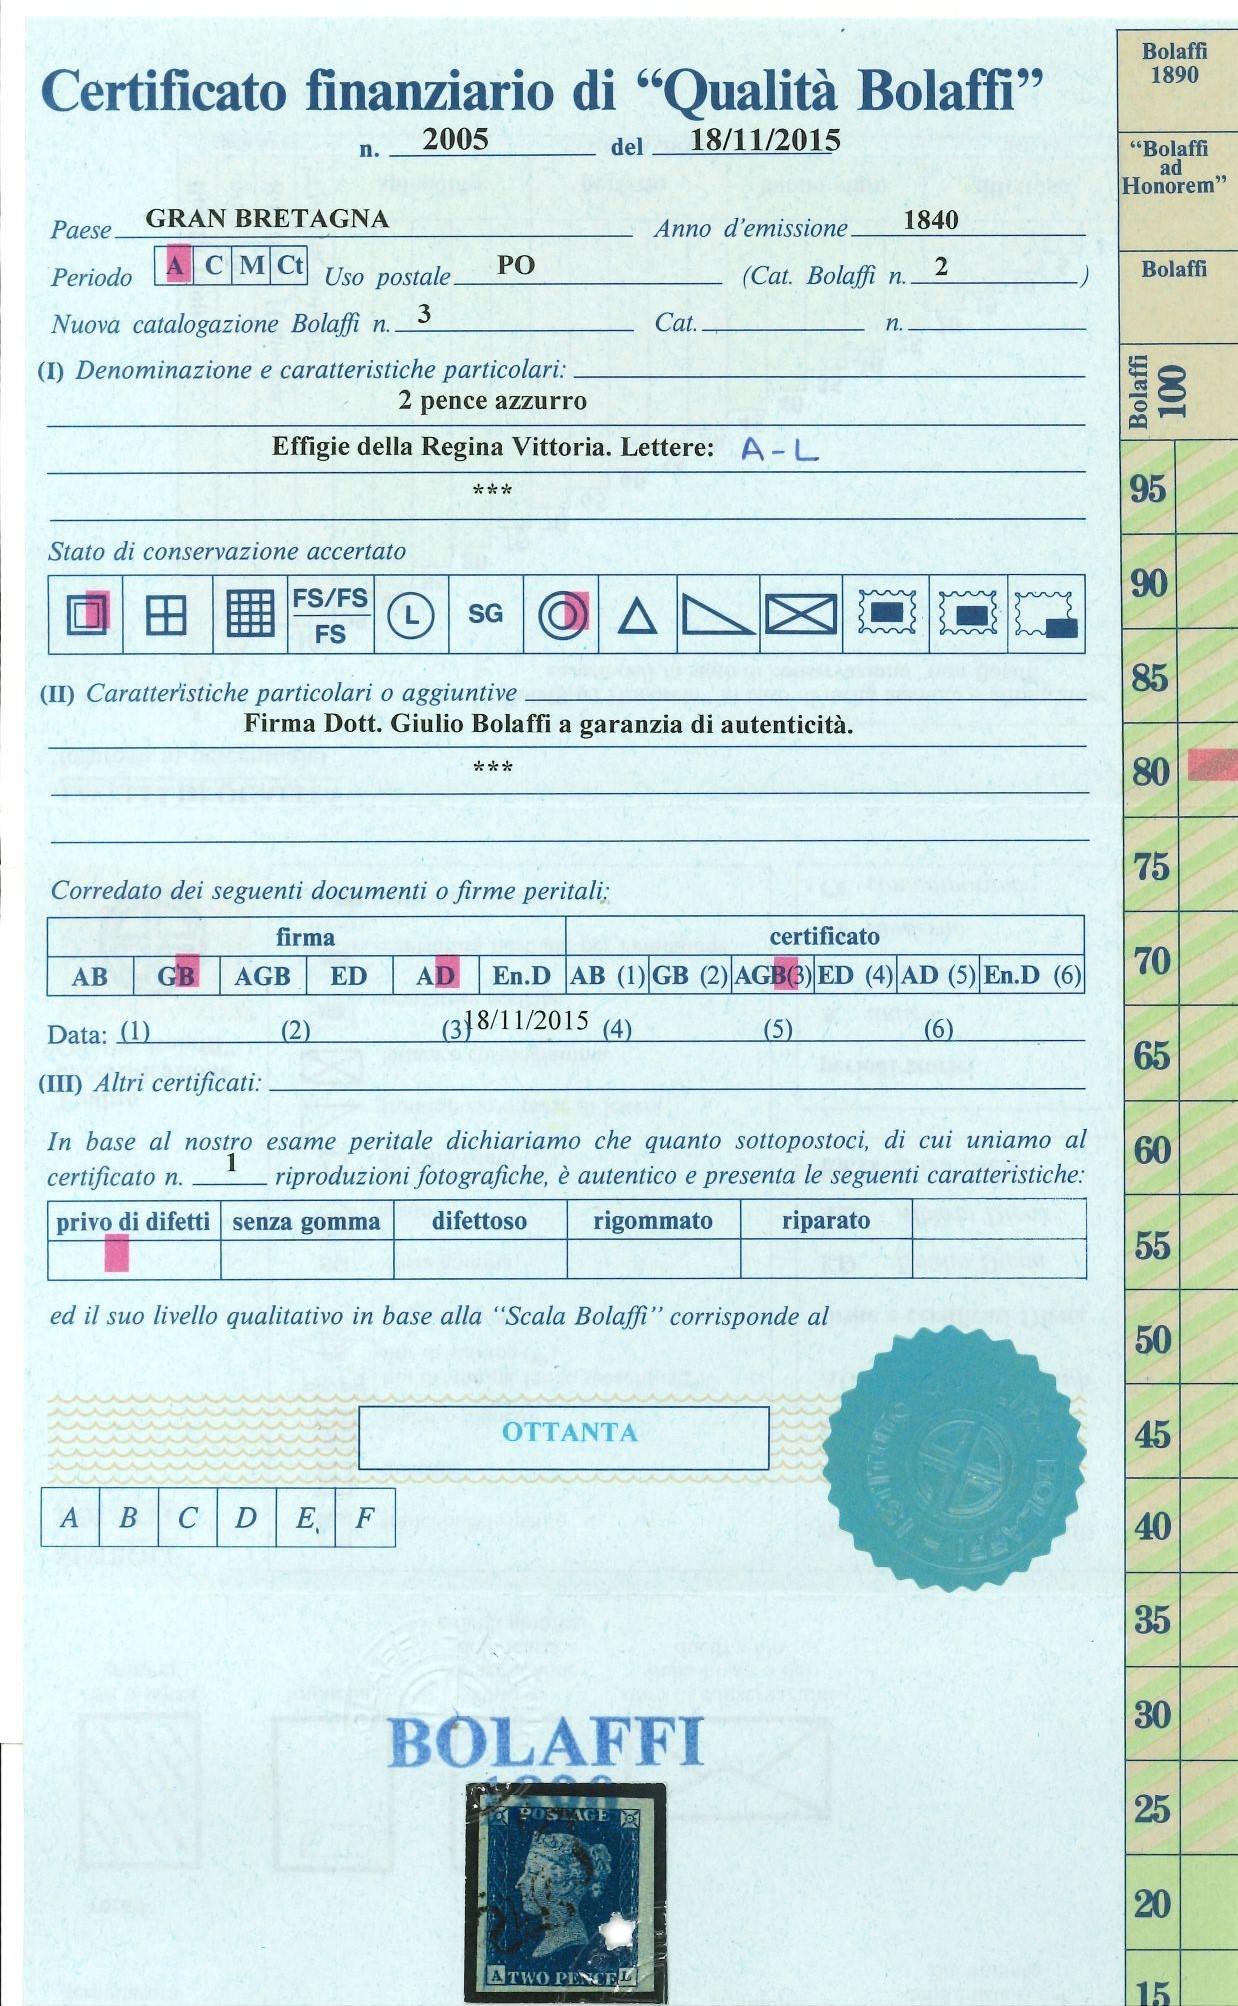 Lot 2463 - gran bretagna Individual lots -  Ponte Auction House Stamps Auction 505